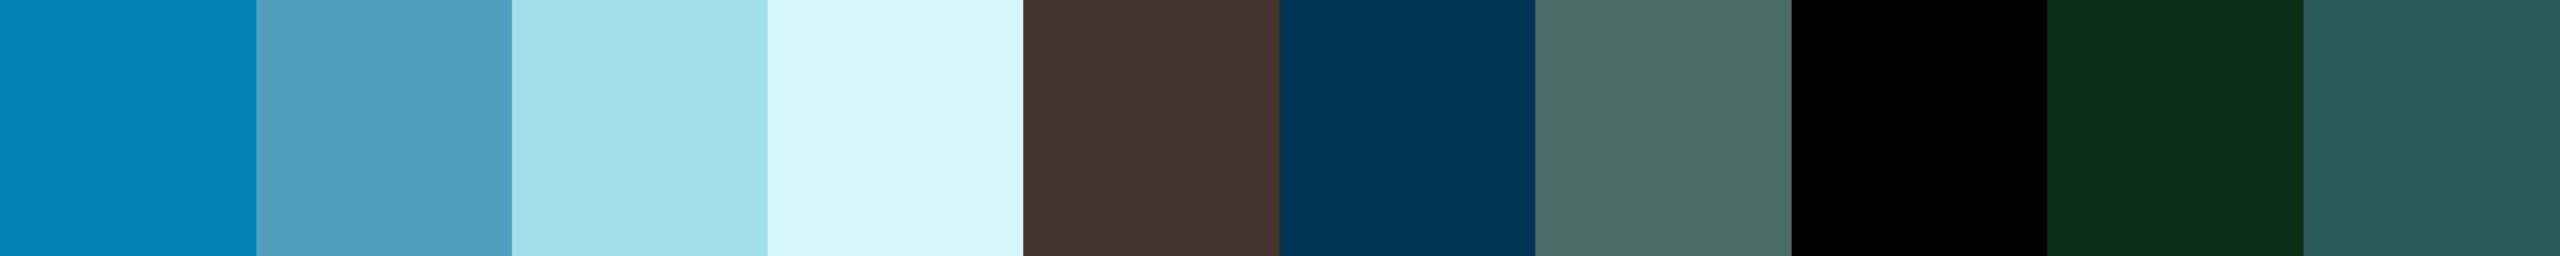 271 Ibalpa Color Palette